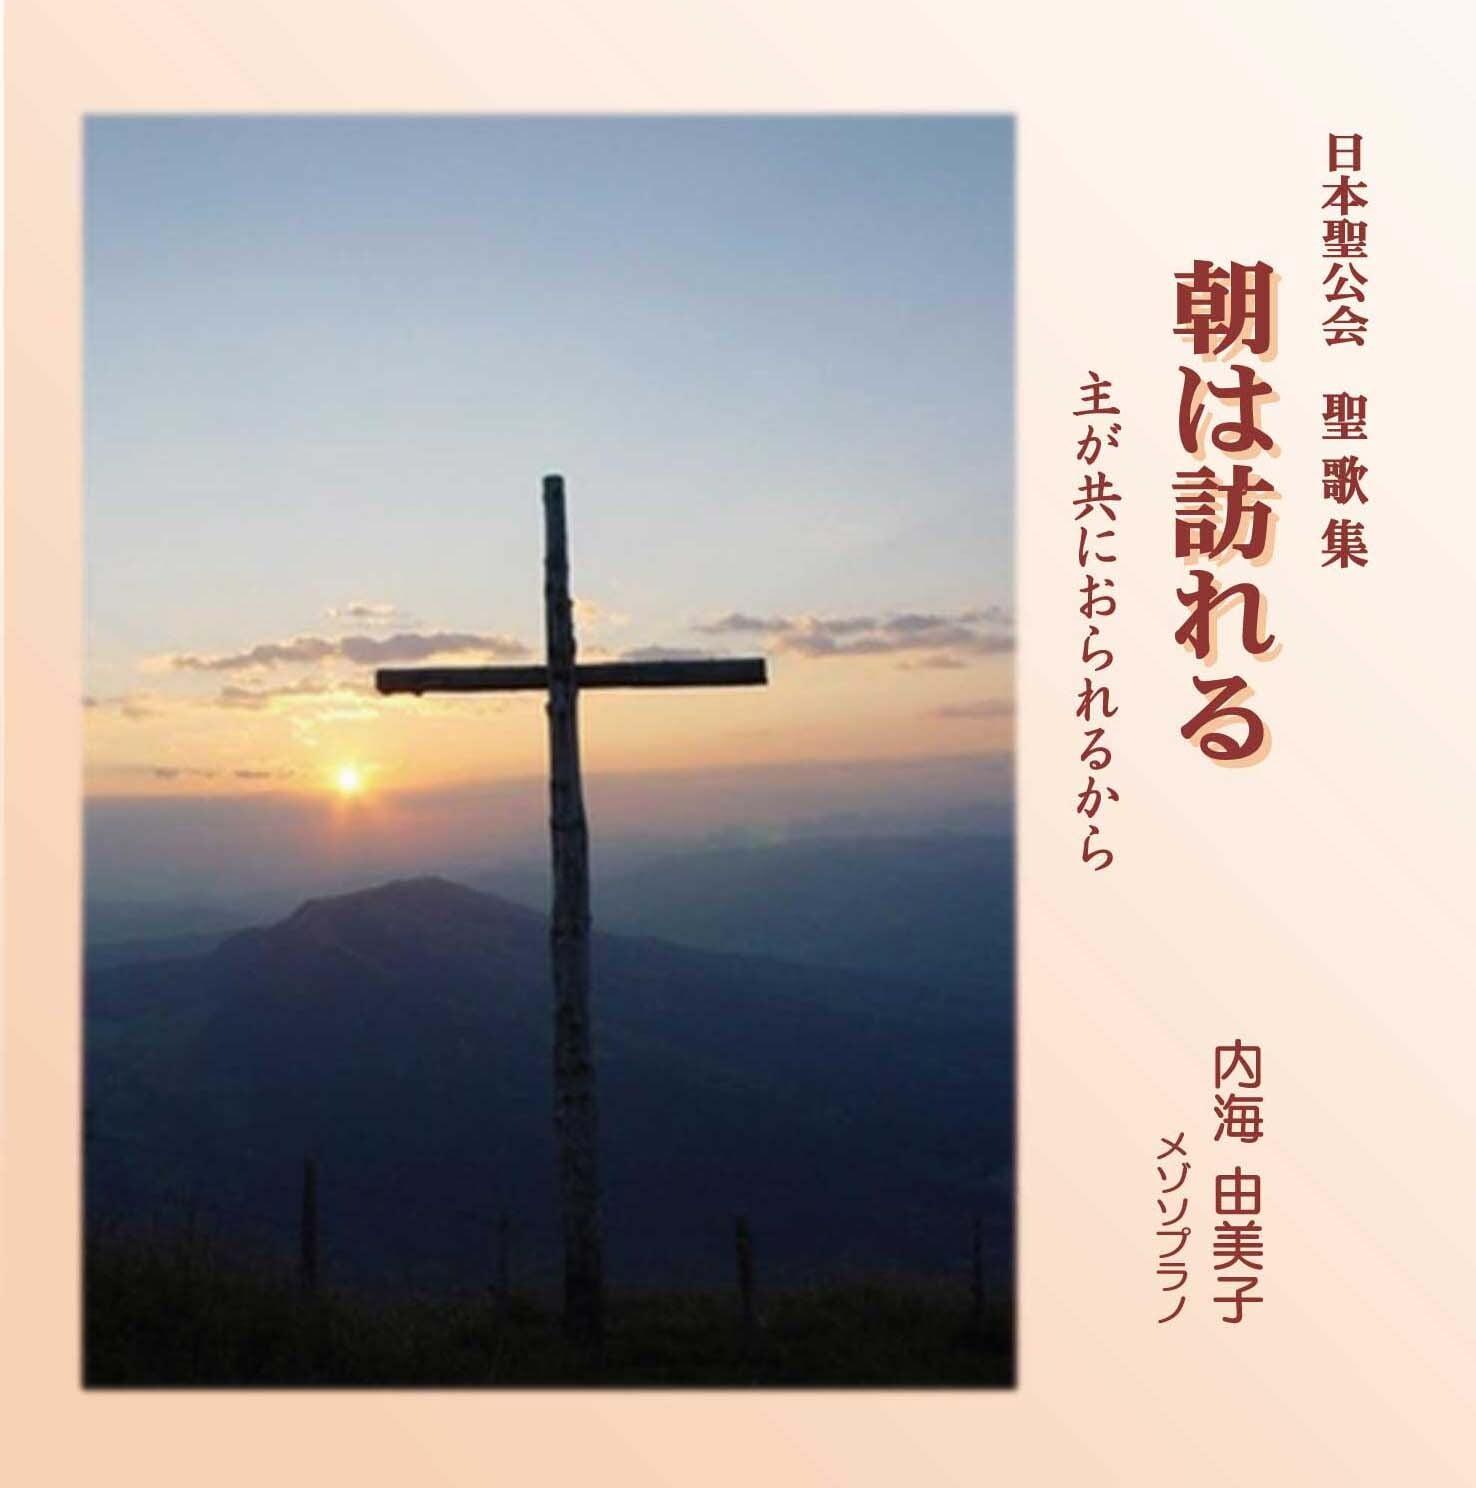 「朝は訪れる」 日本聖公会 聖歌集    演奏:内海由美子、辻彩乃